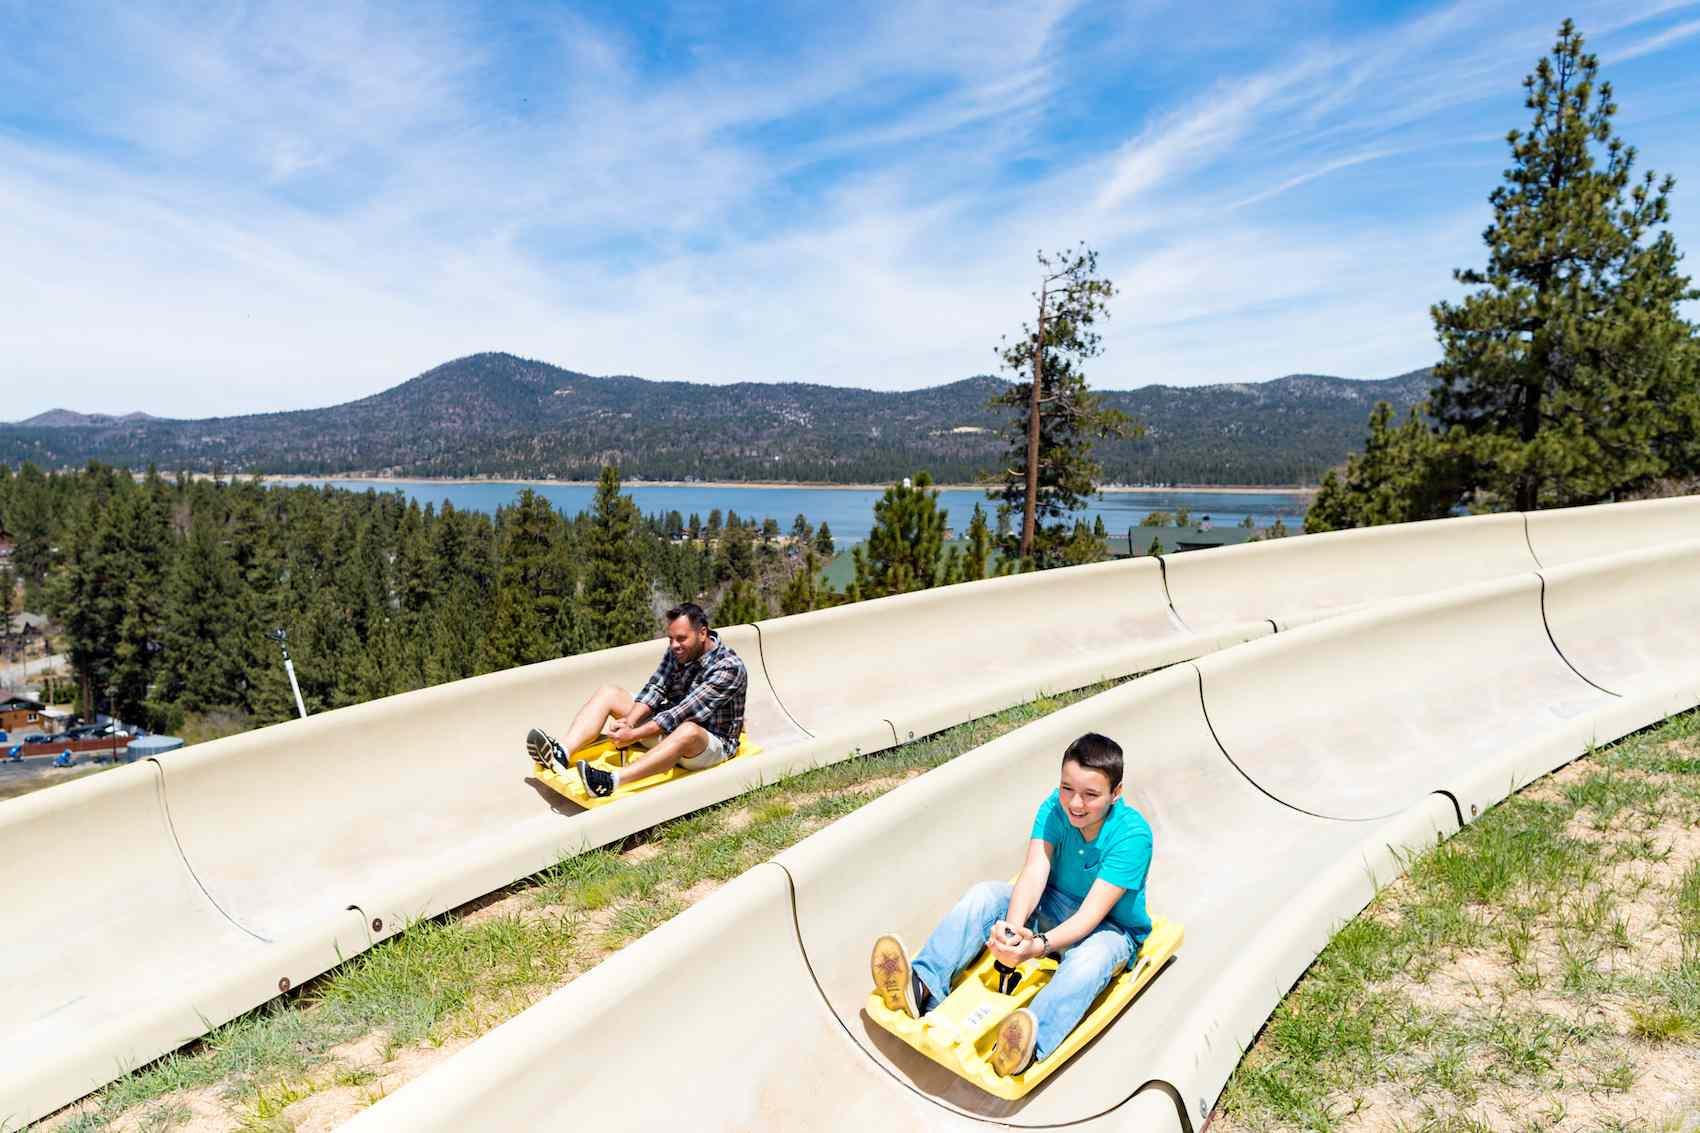 The Alpine Slide at Magic Mountain